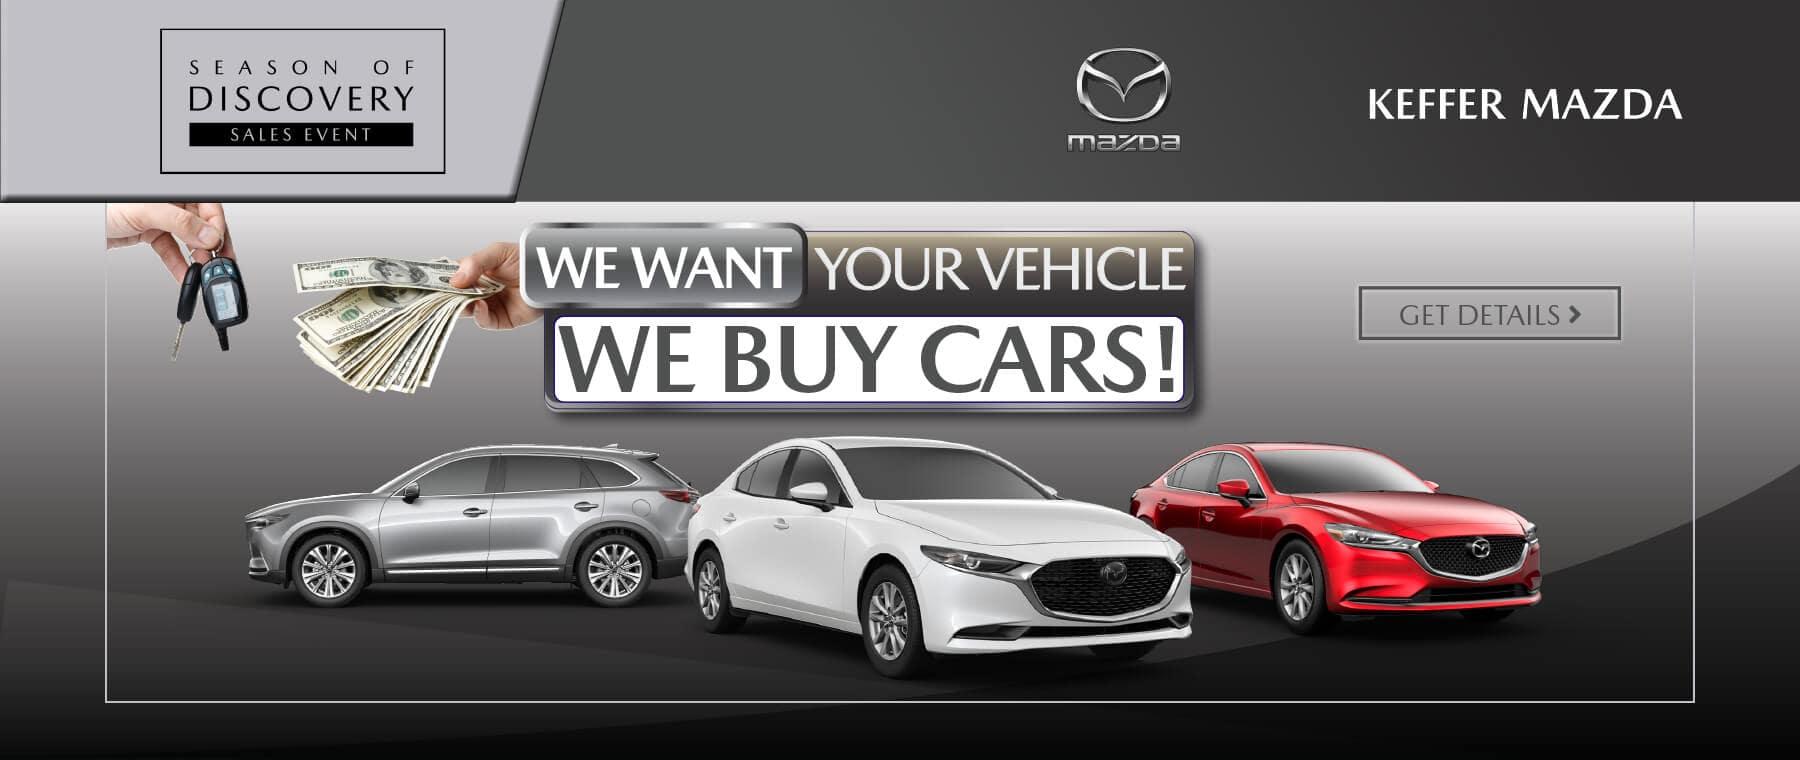 2021.06.02_Keffer-Mazda-We-Buy-Cars-Web_S52571ll